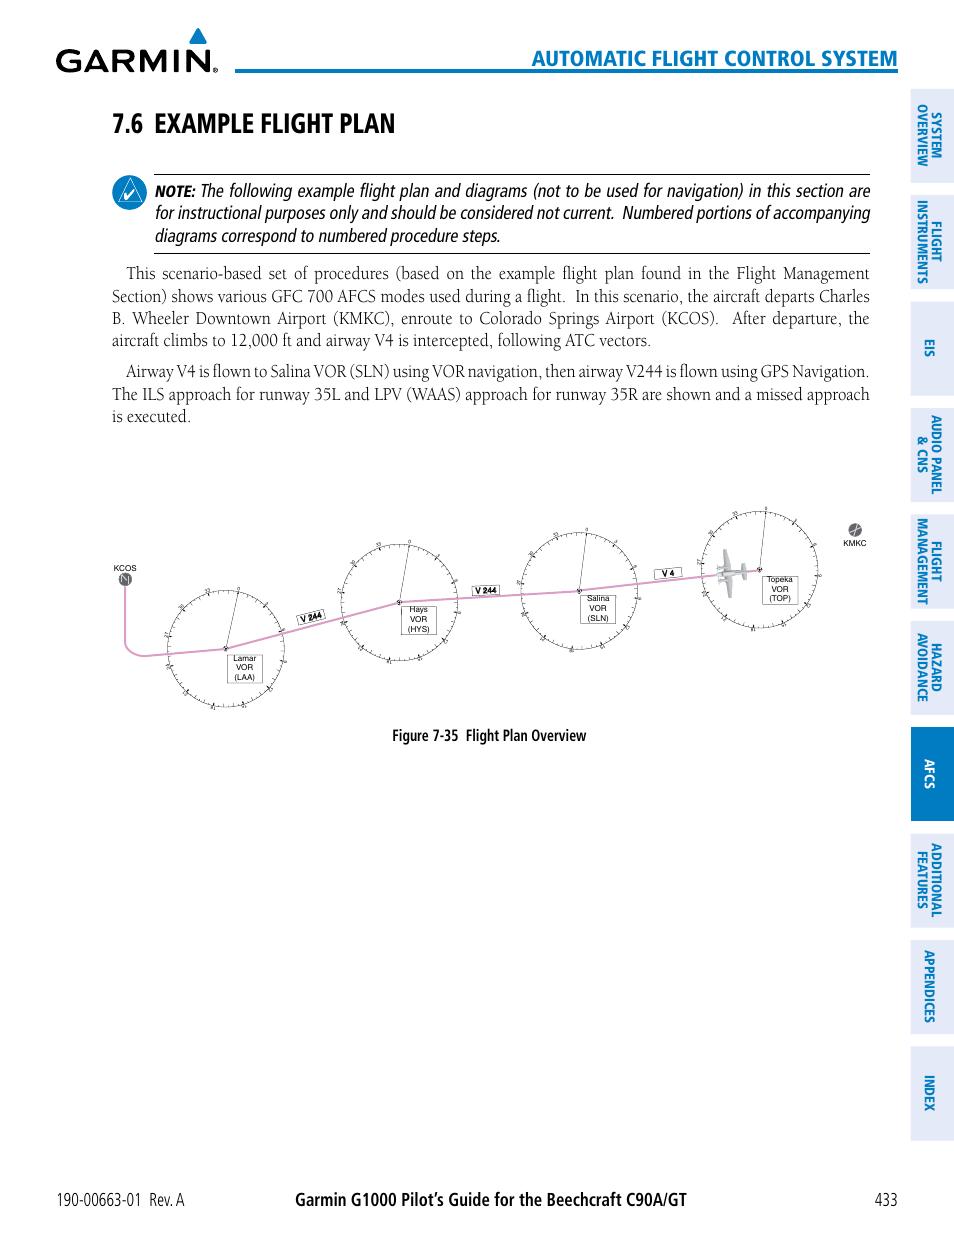 King Air Flight Manual Lear Peterbilt Fuse Box Array 6 Example Plan Automatic Control System Figure 7 35 Rh Manualsdir Com